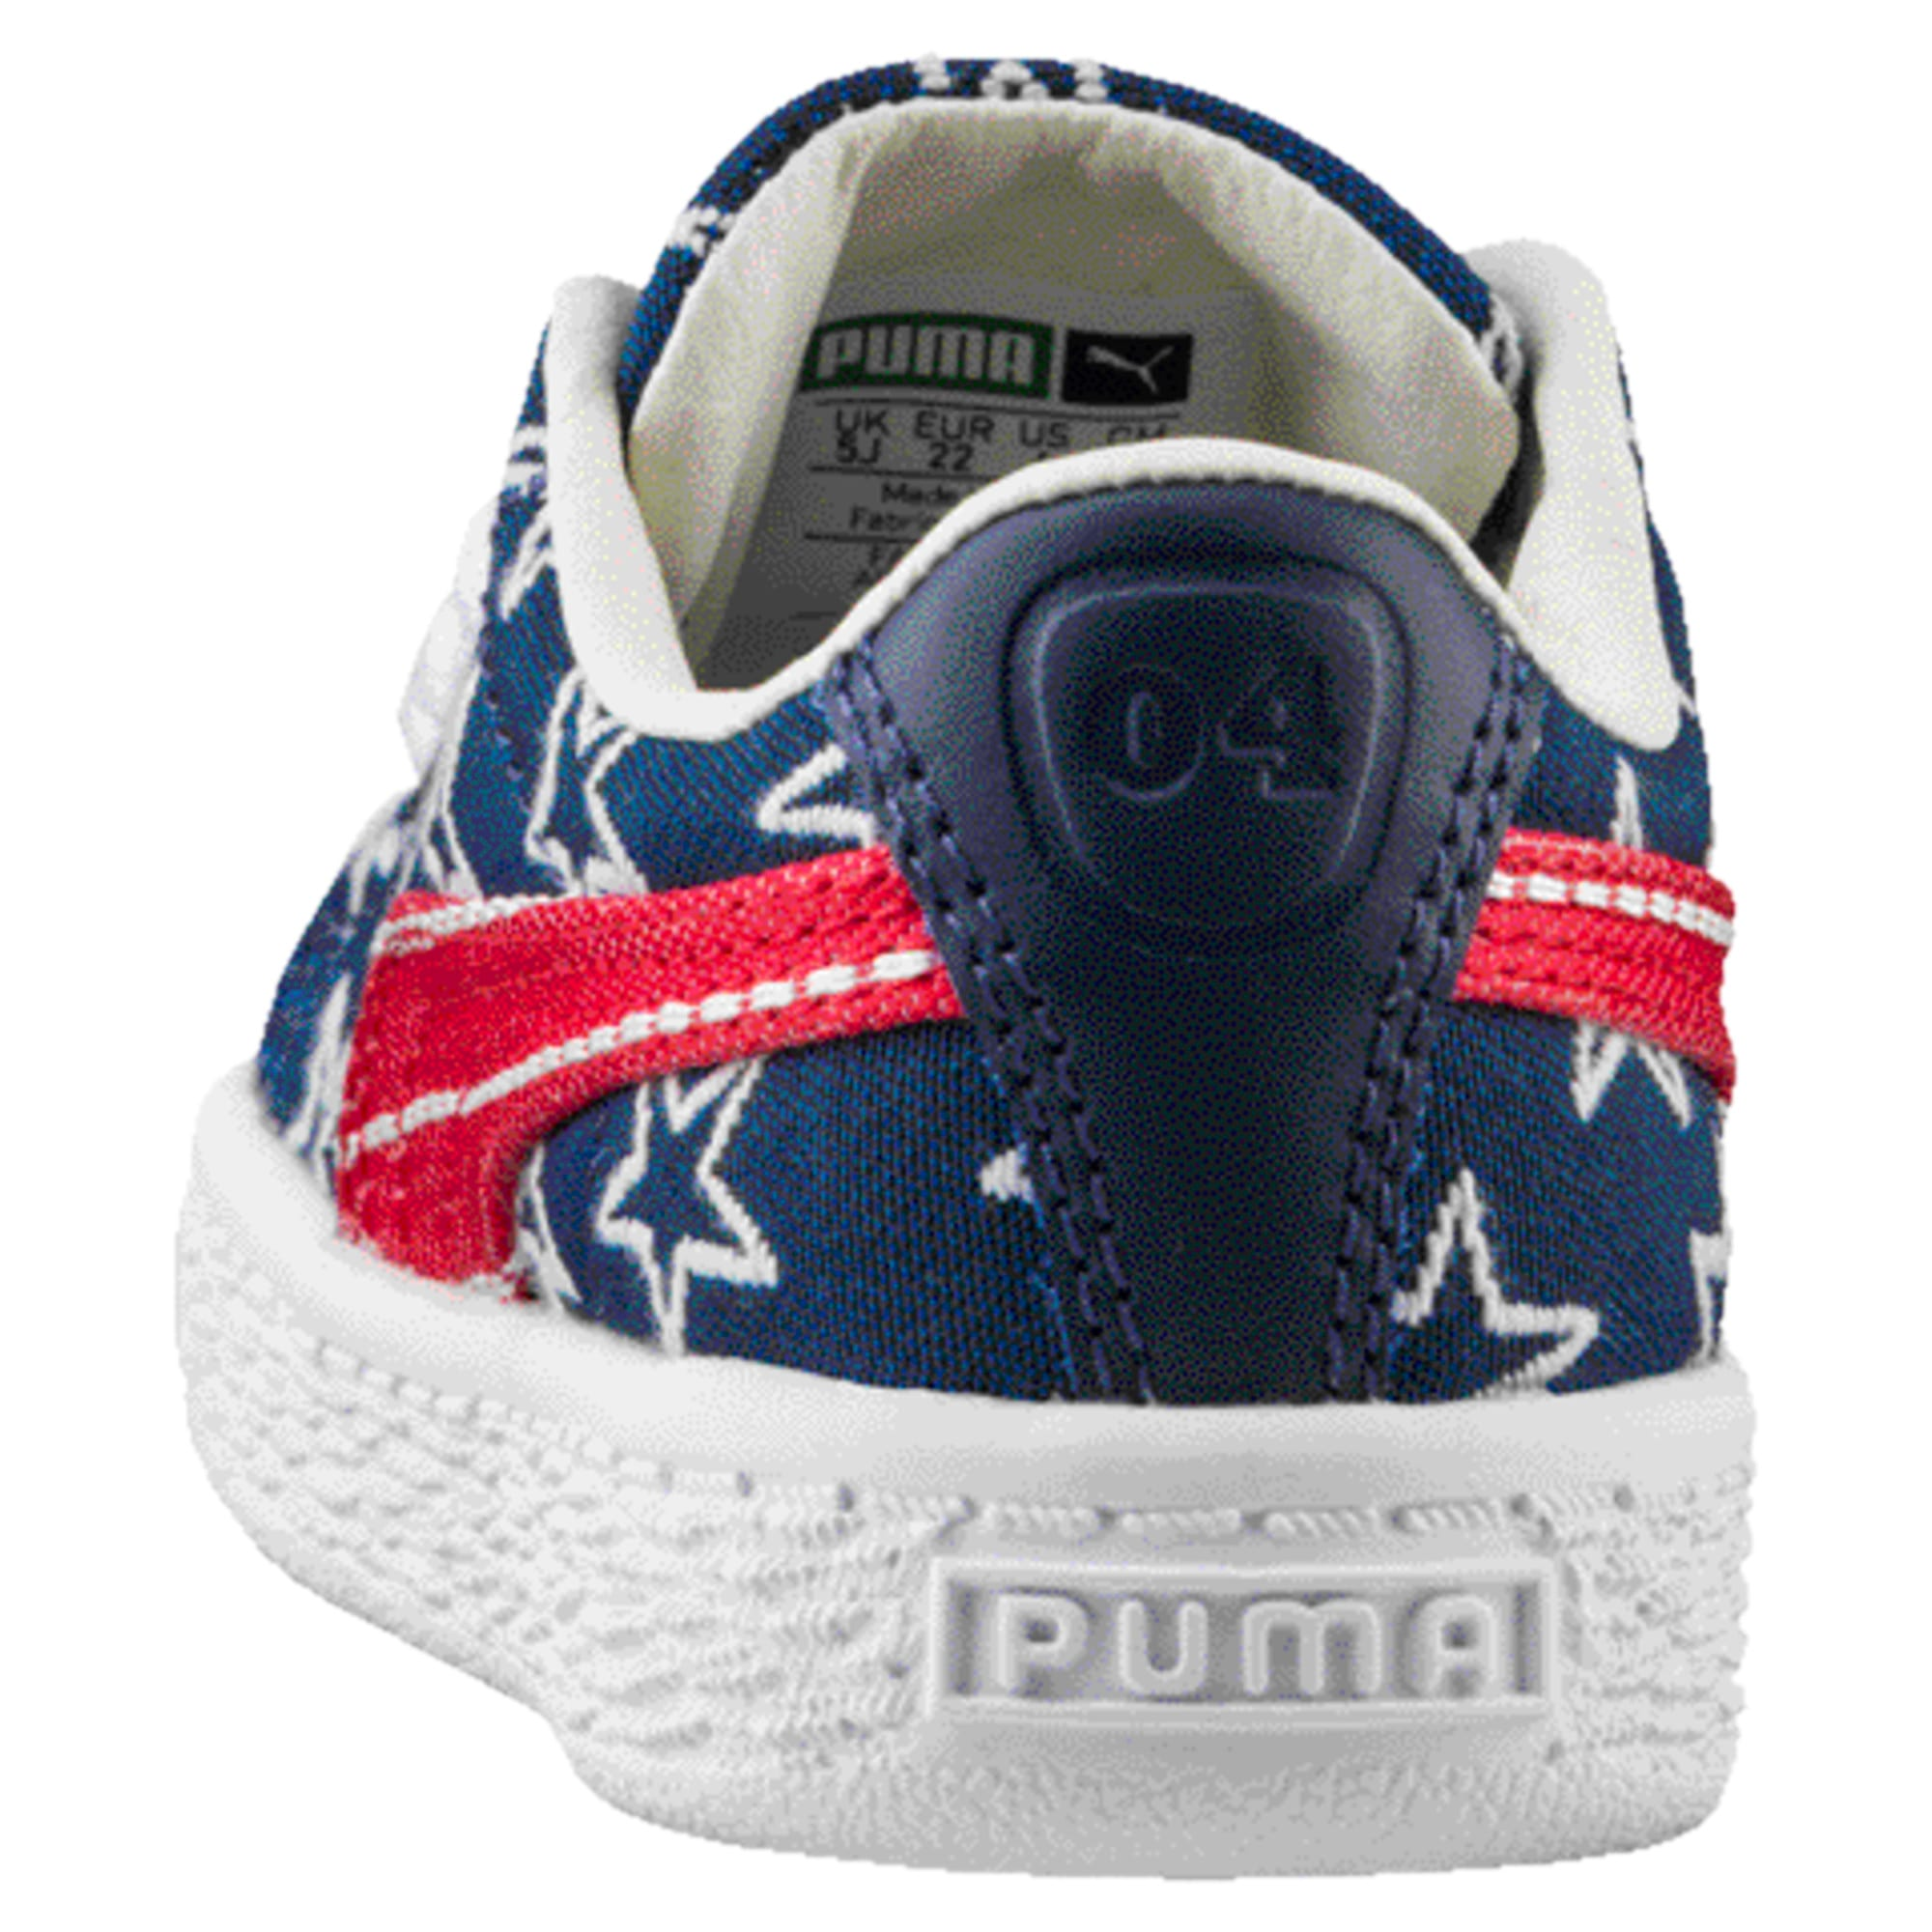 puma basket classic 4th of july